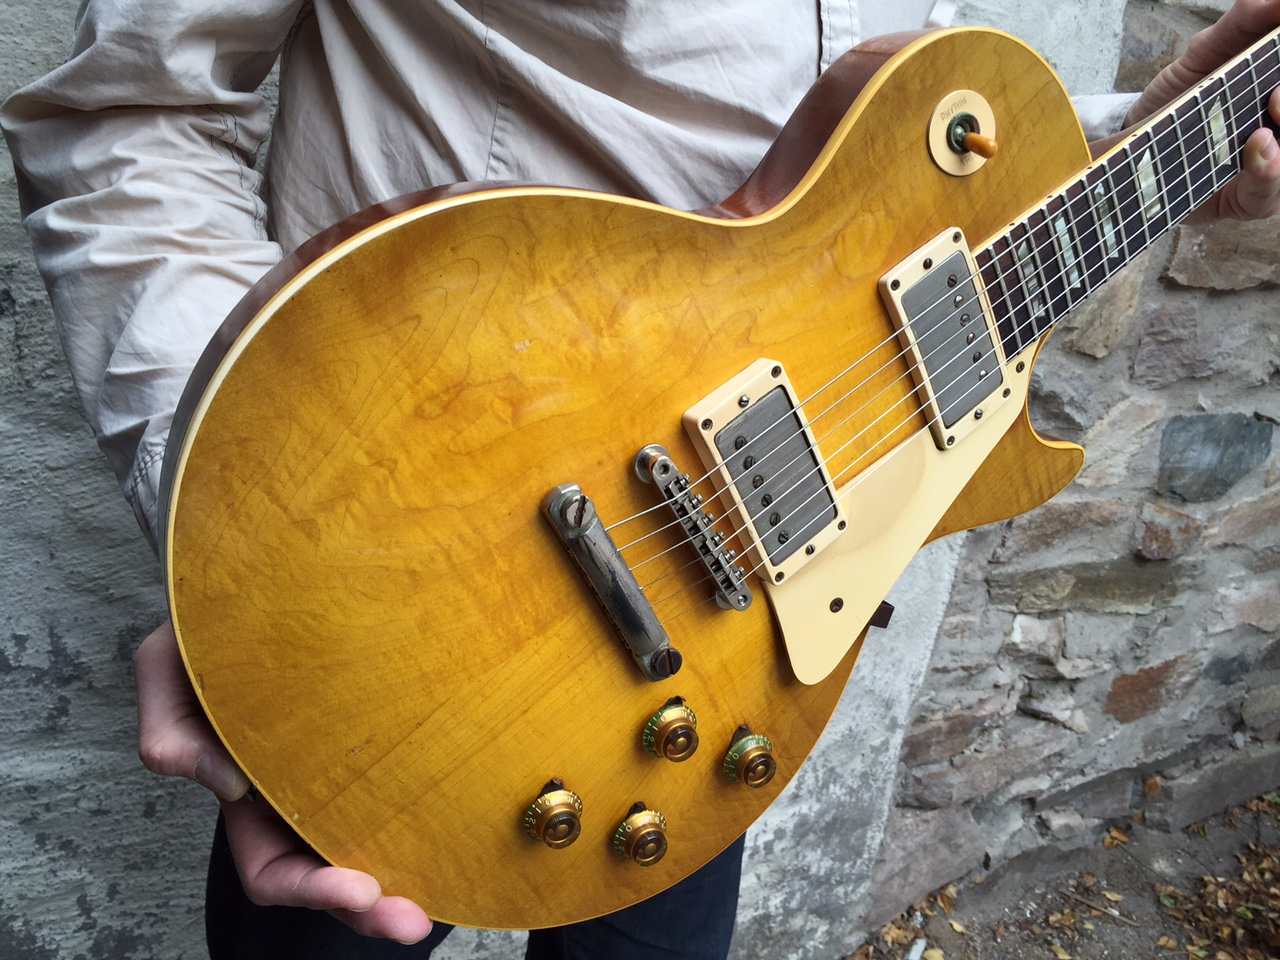 gibson les paul standard 1959 sunburst guitar for sale anders anderson guitars. Black Bedroom Furniture Sets. Home Design Ideas